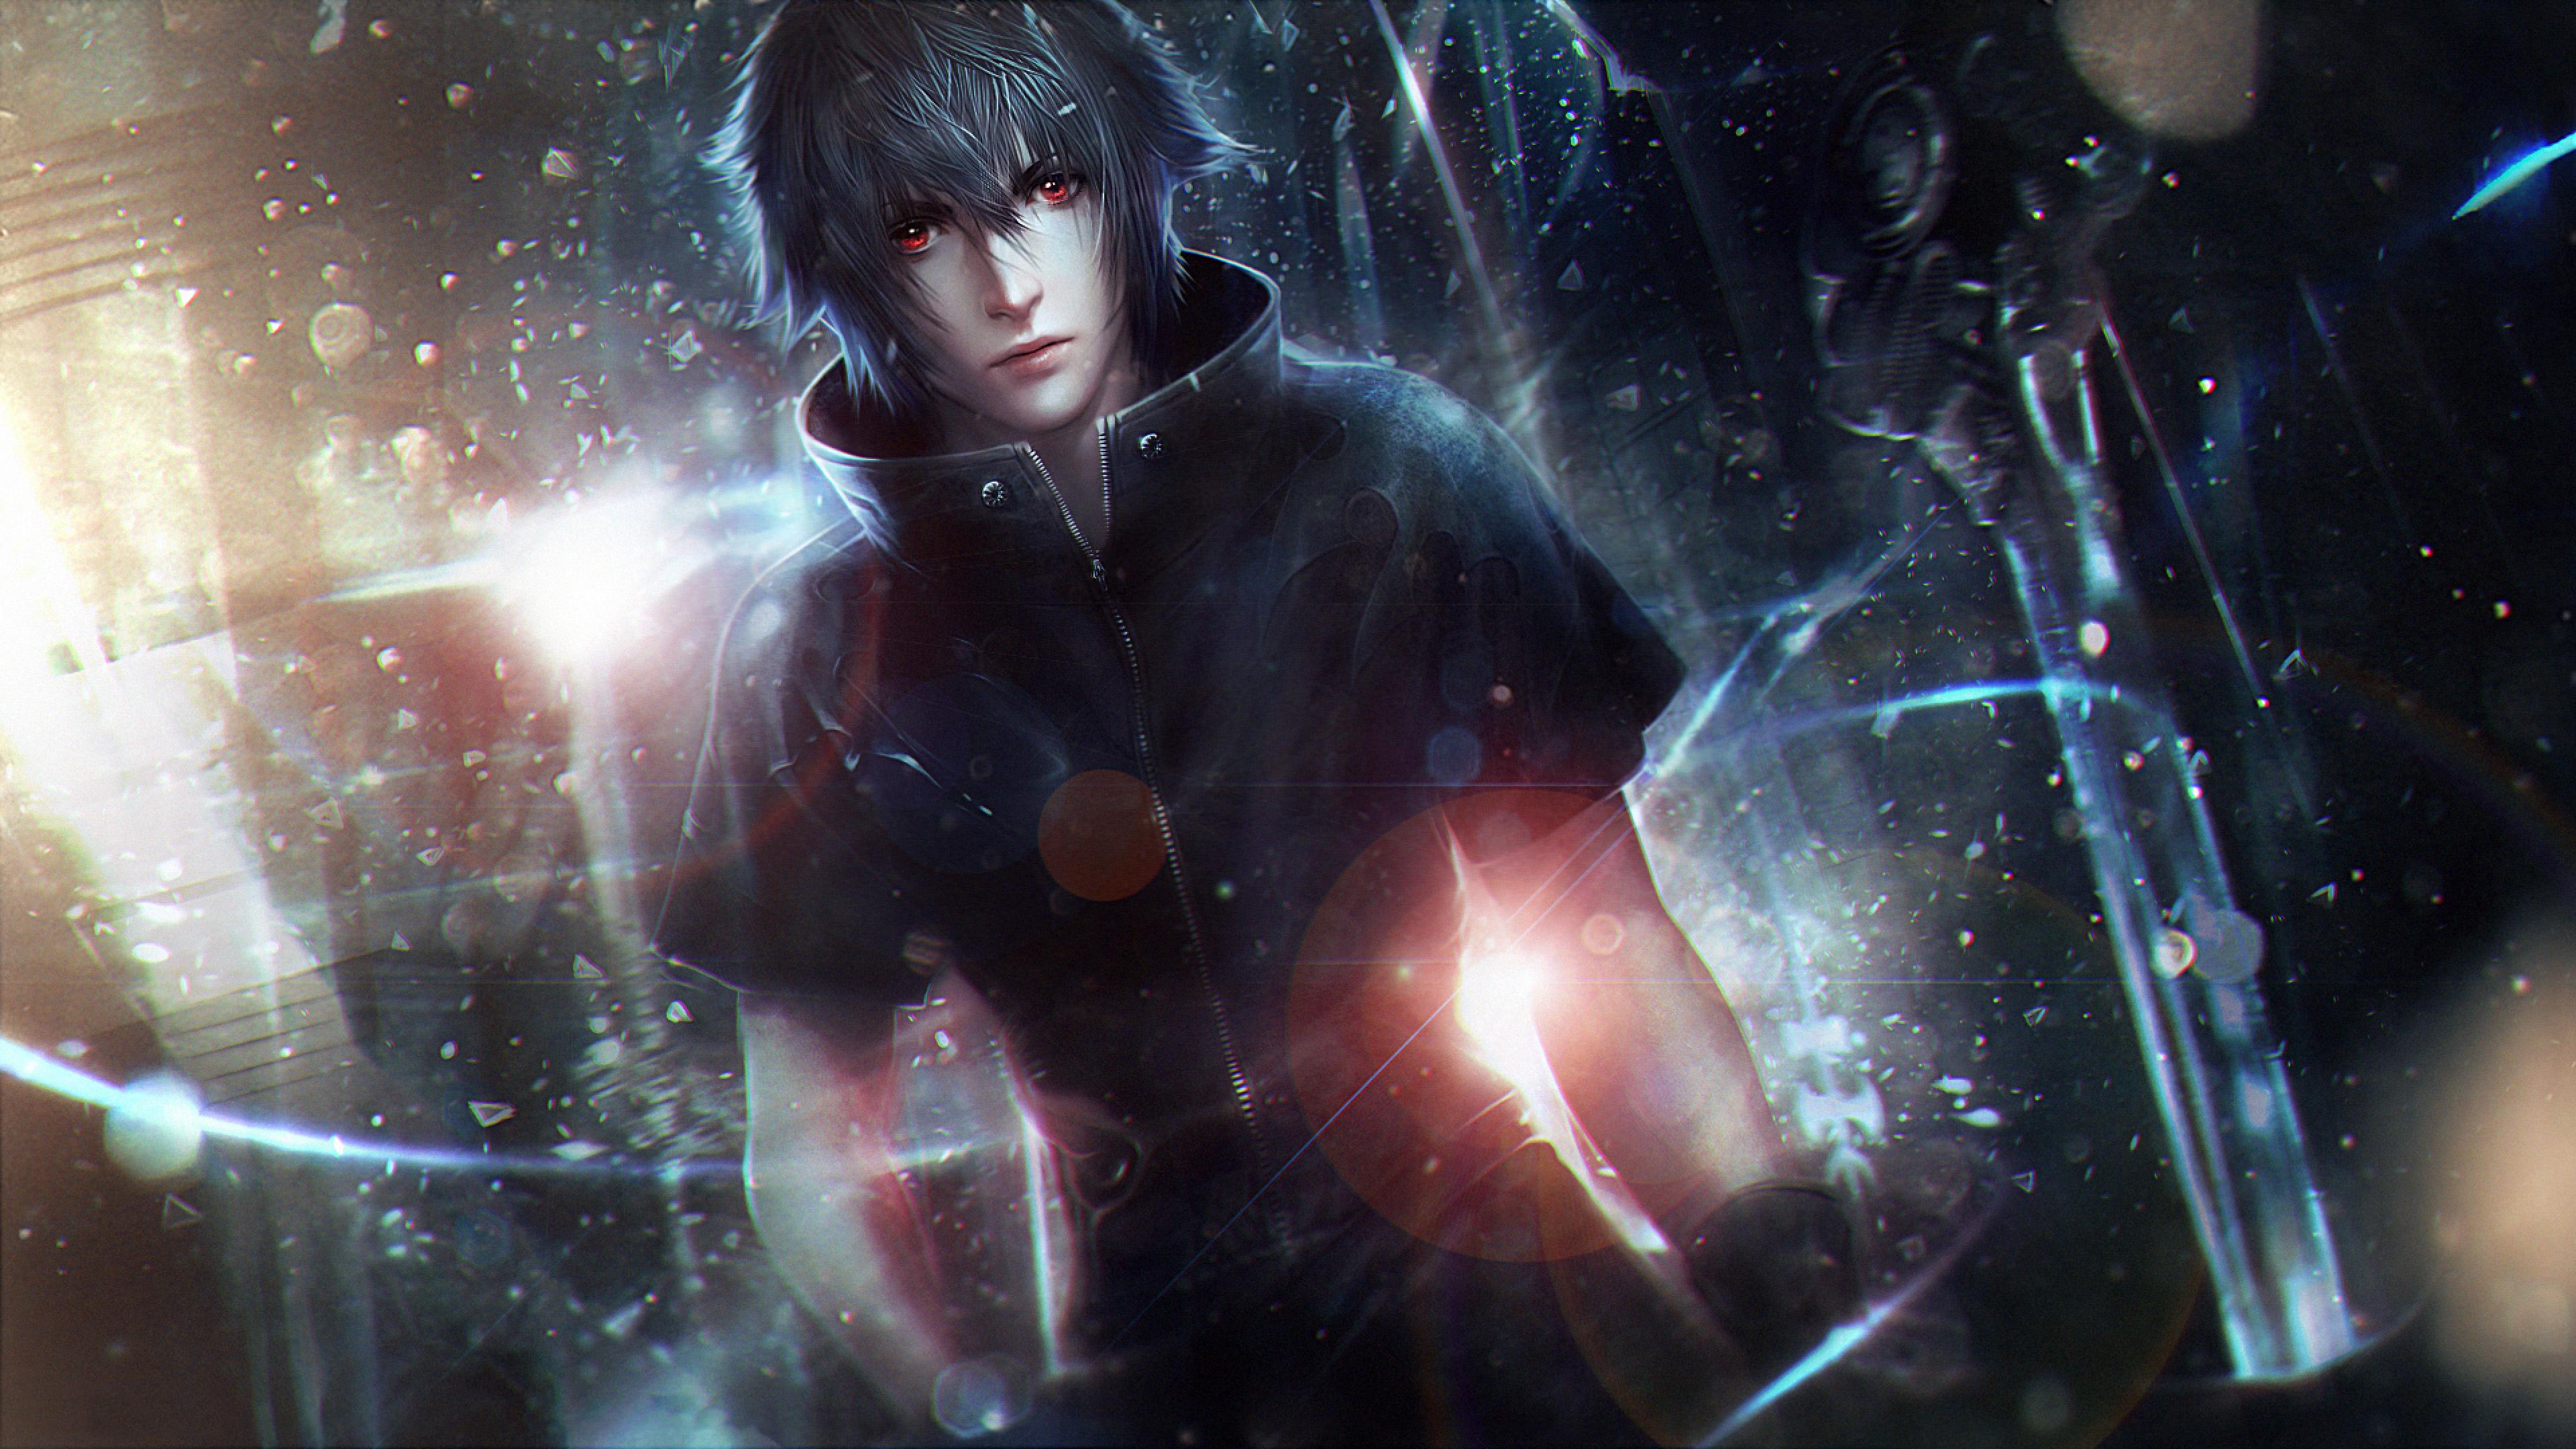 Noctis Lucis Caelum Final Fantasy Xv Artwork Hd Games 4k